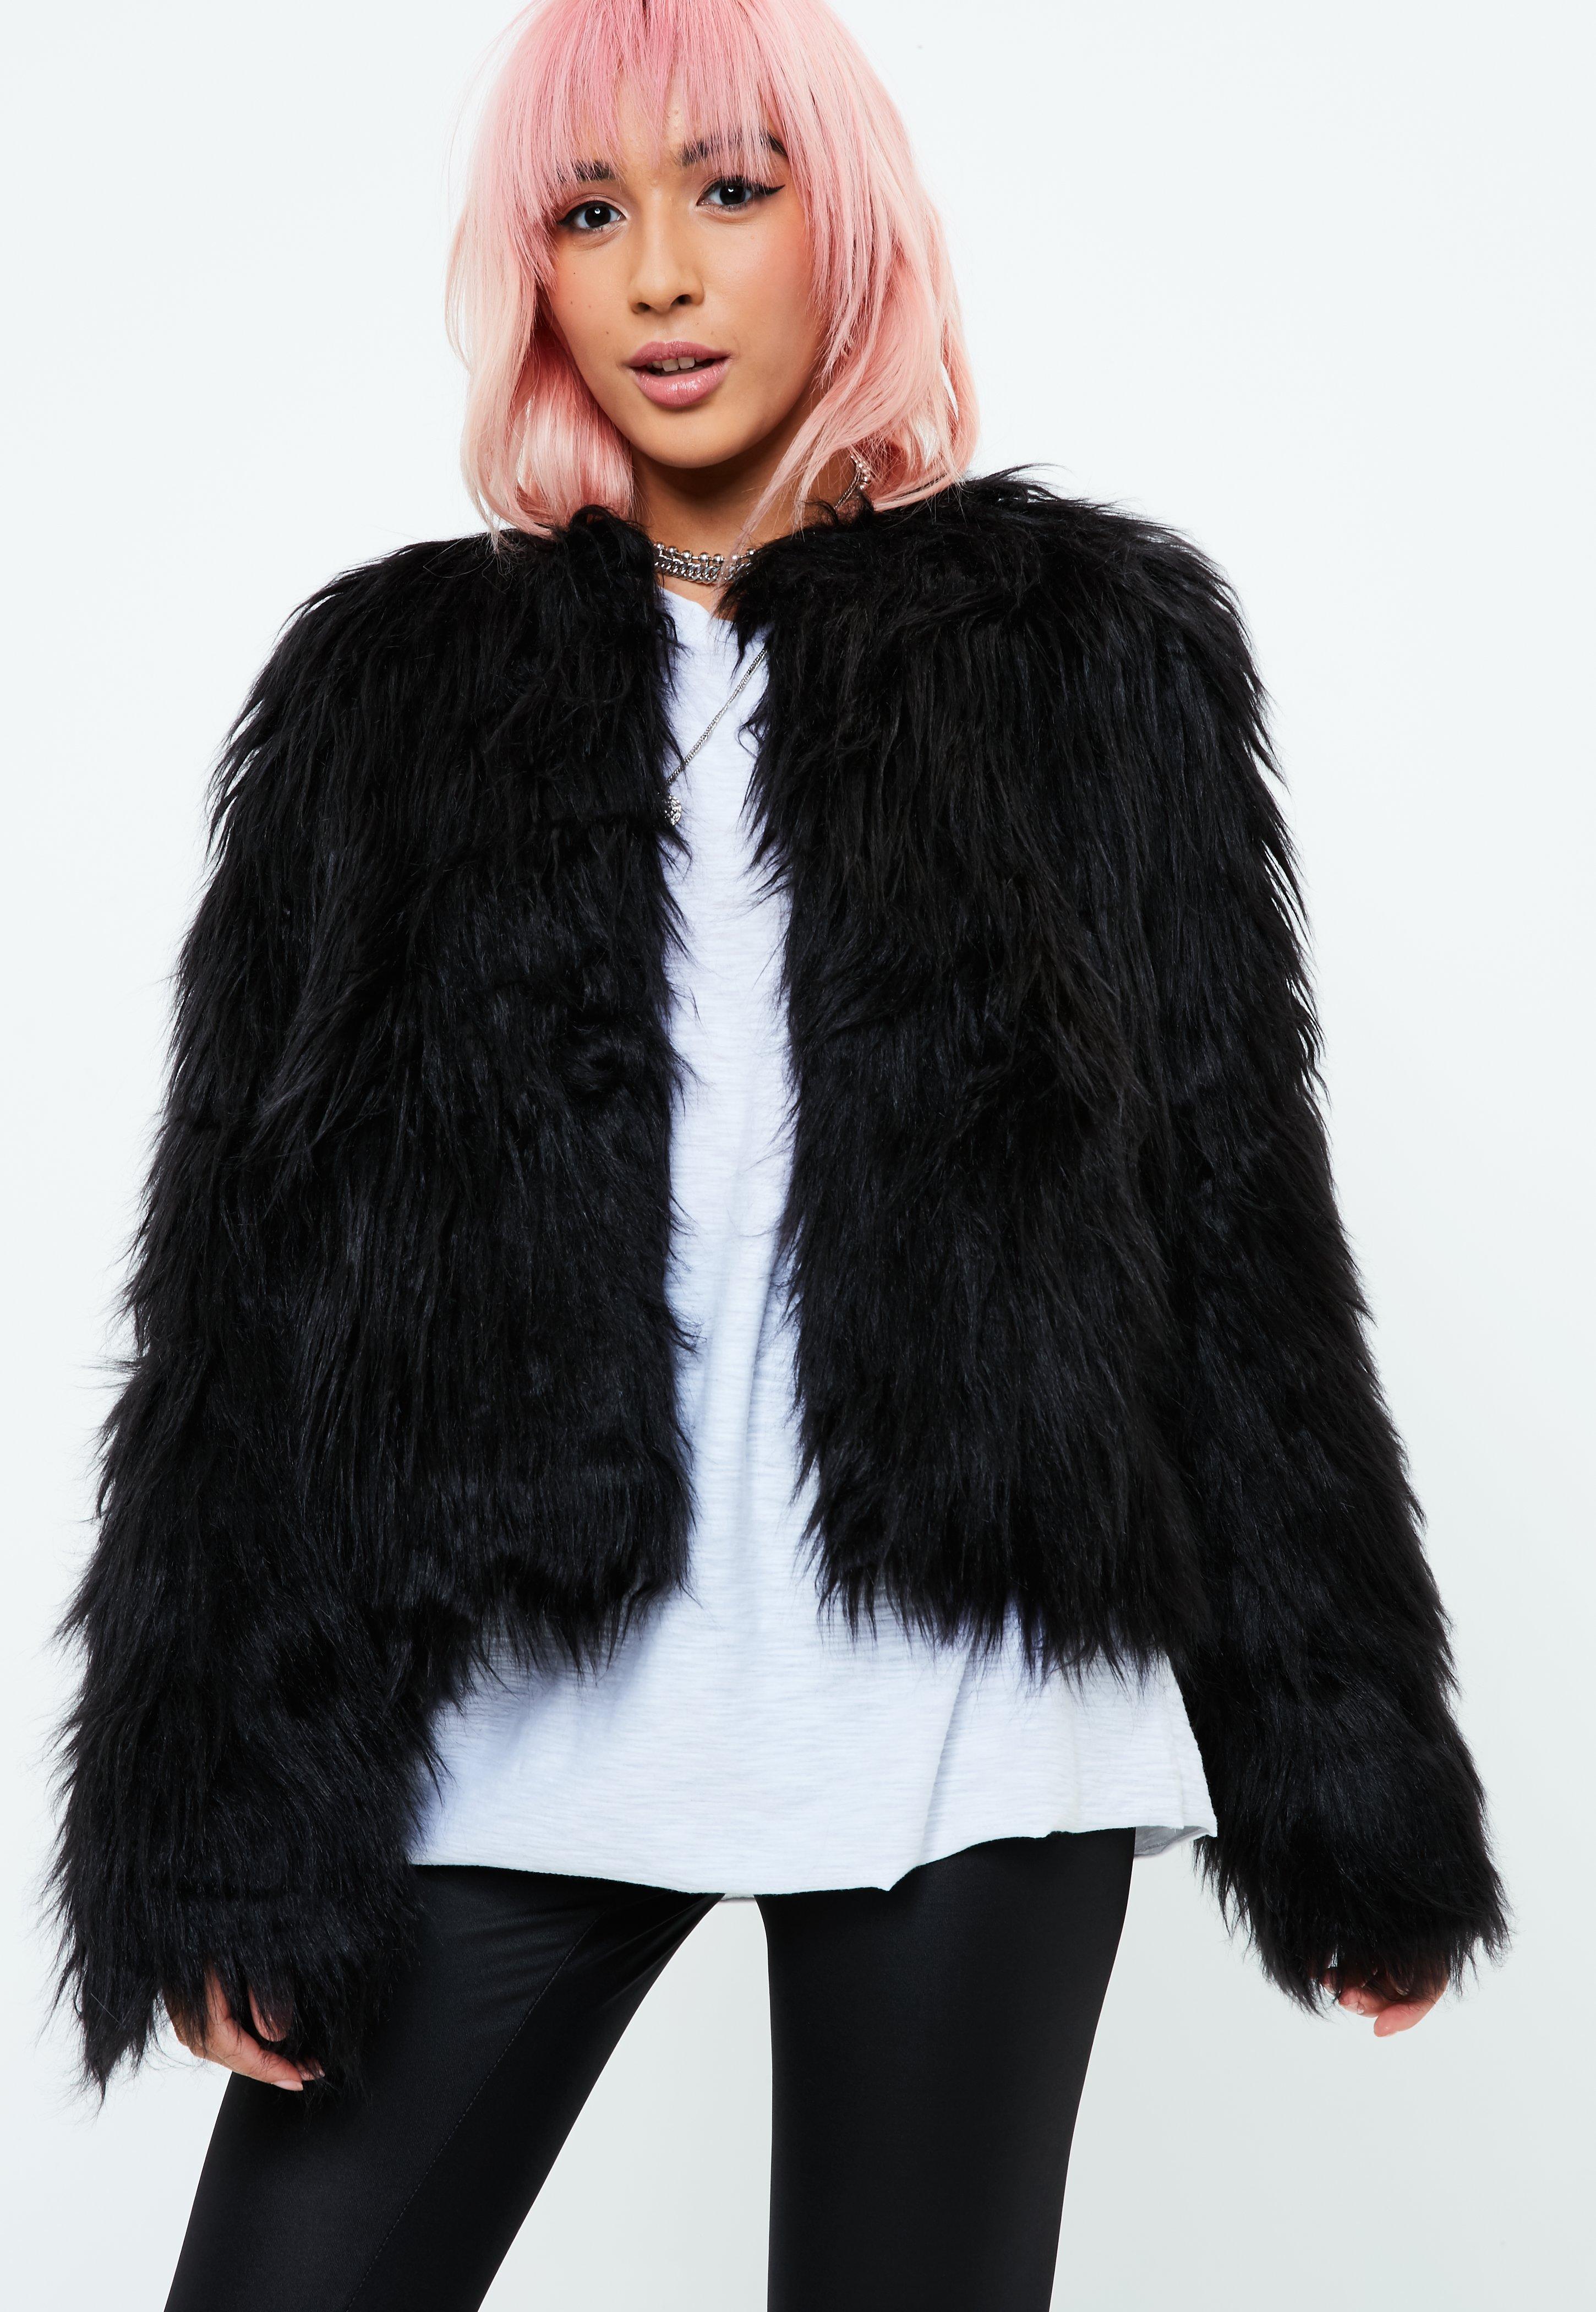 2cb7a93069809 Missguided Black Shaggy Faux Fur Coat in Black - Lyst